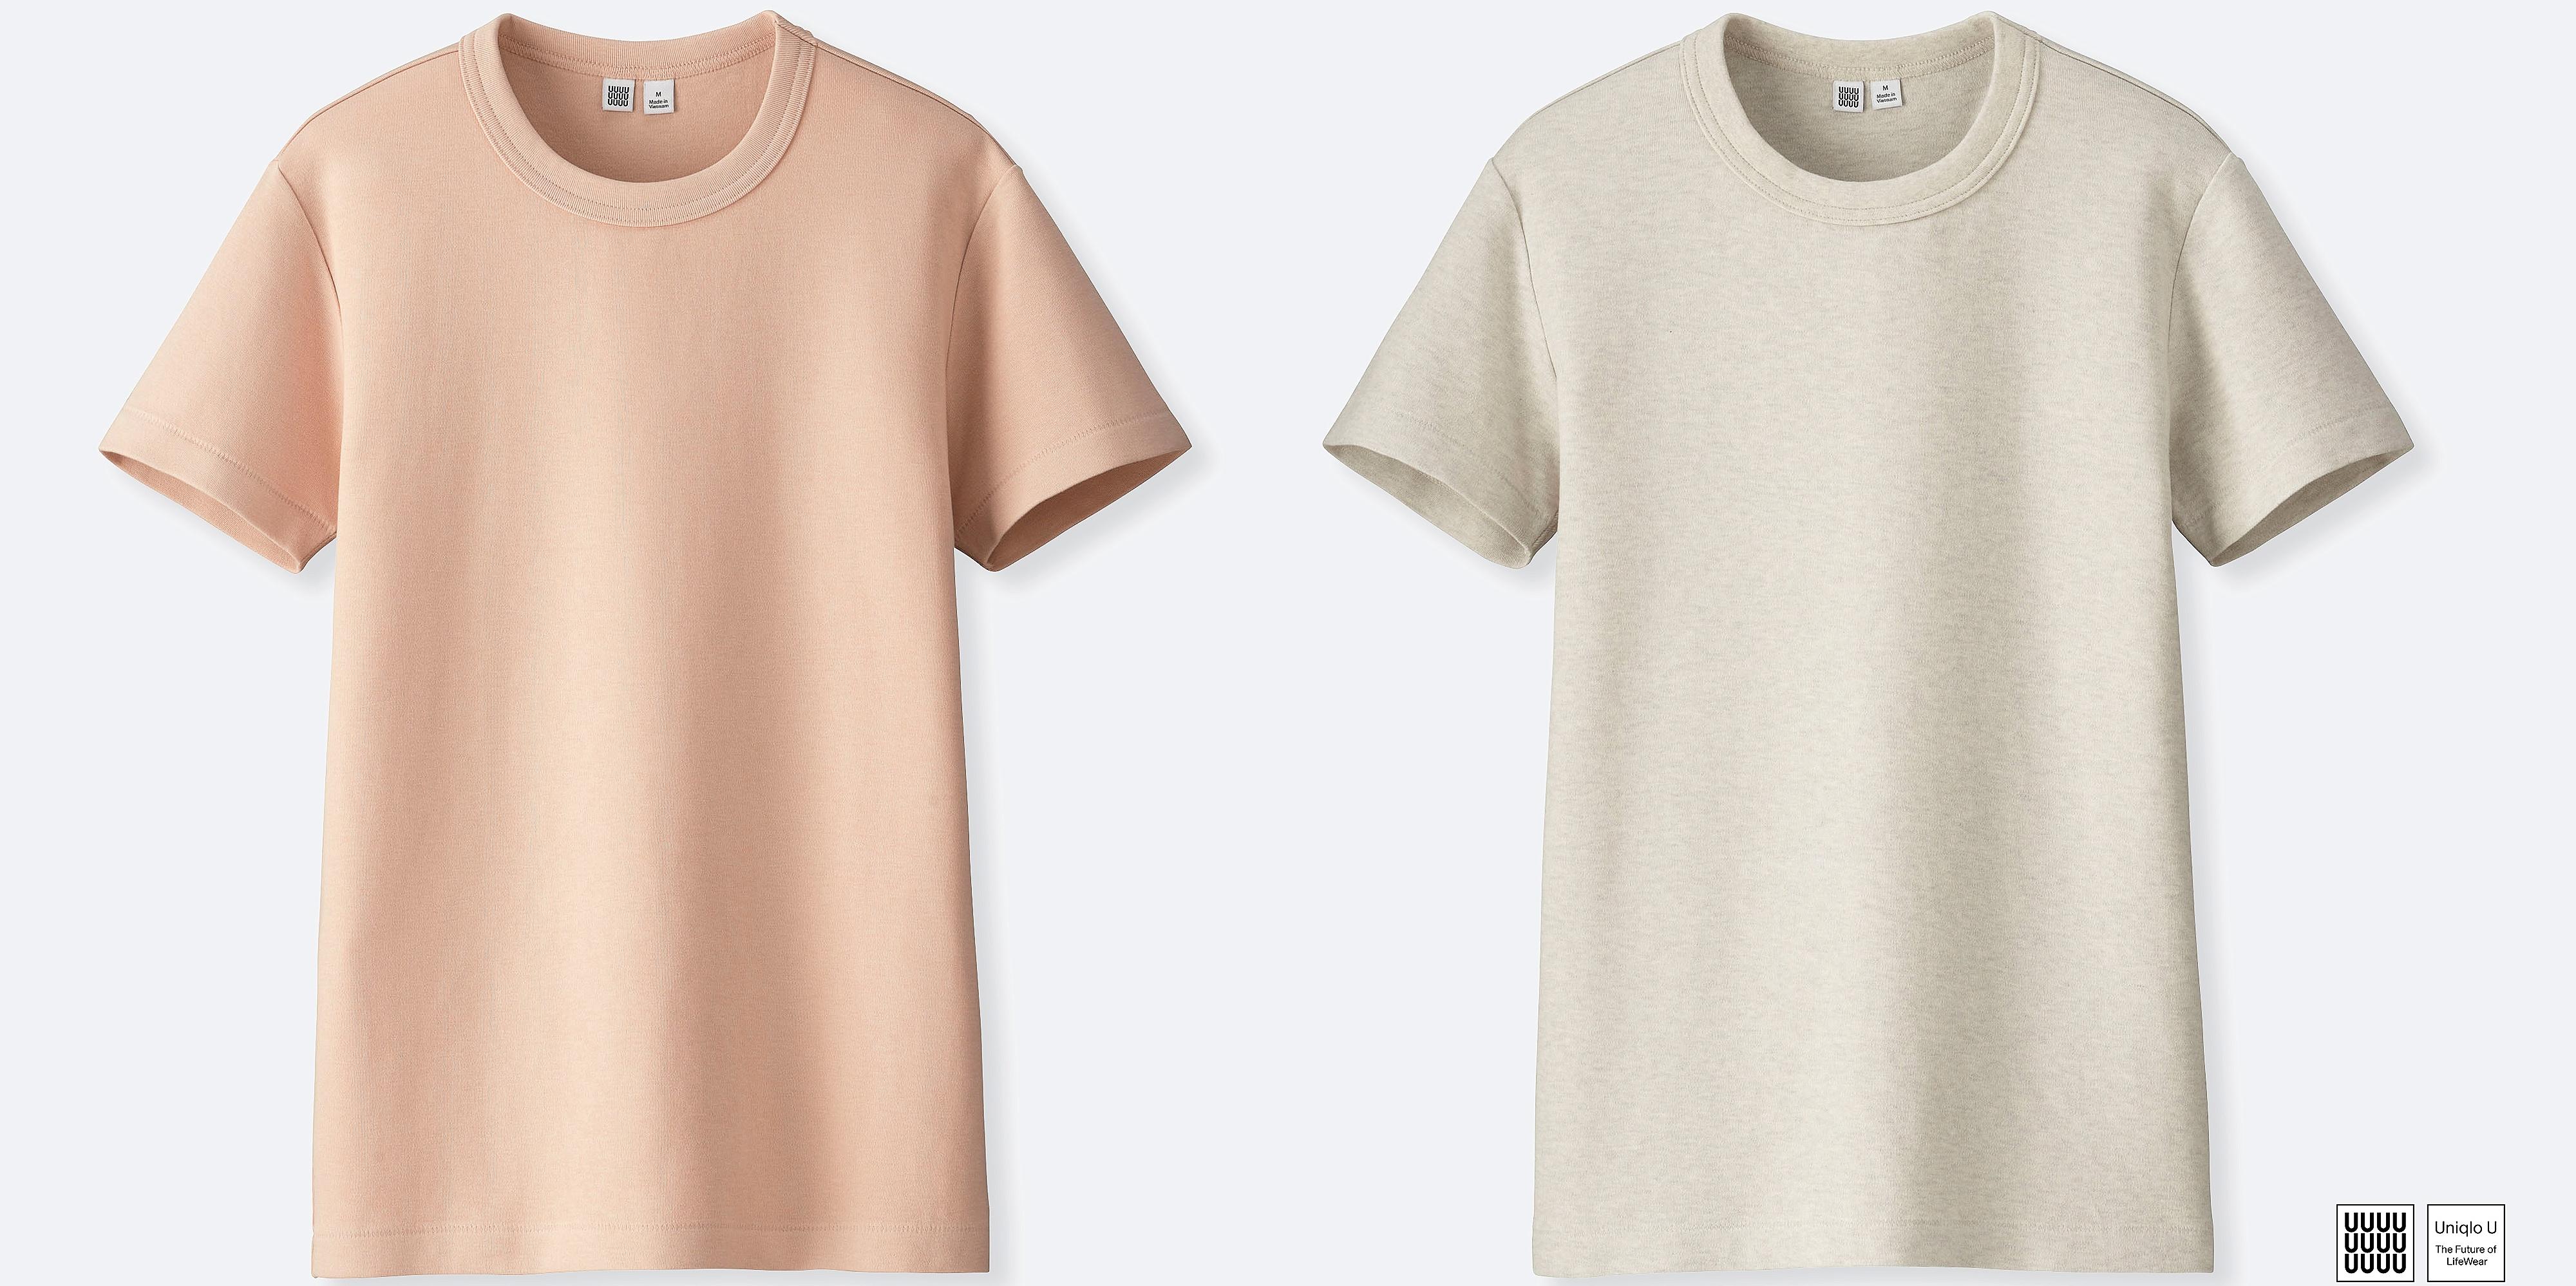 cdae871e8 2017 UNIQLO U crew neck short sleeve cotton t-shirt Gray Pink   Me ...